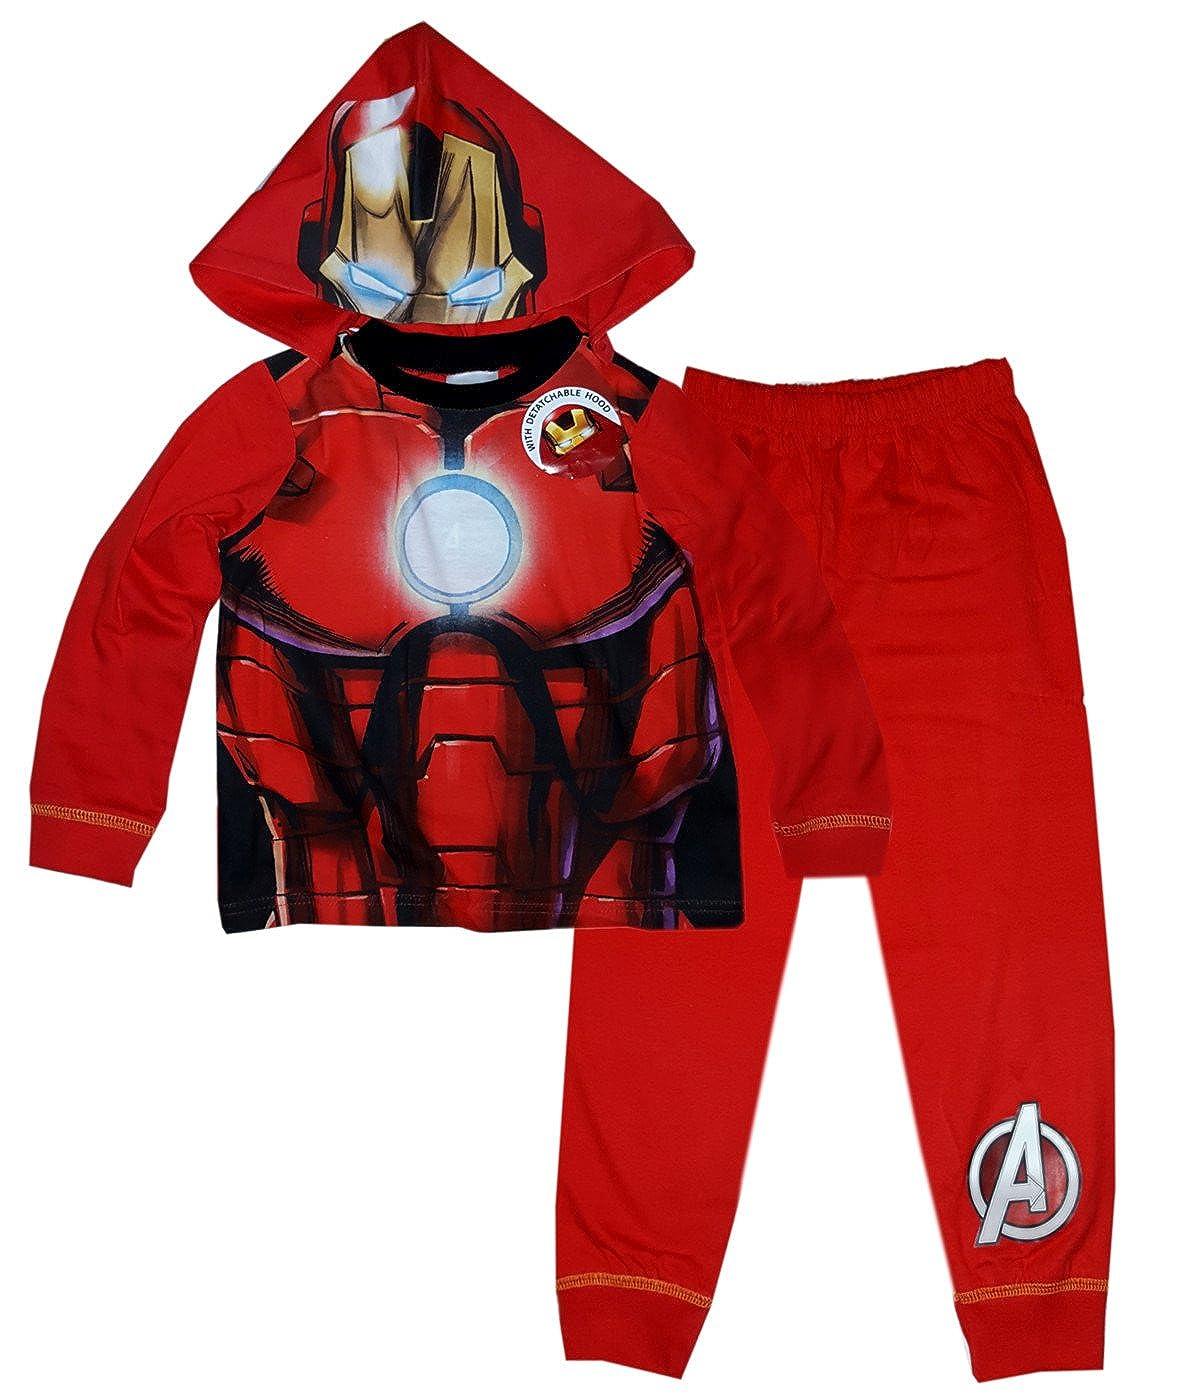 The Hulk Boys Avengers Capt America Novelty Pajamas Pj Age 2-8 Years